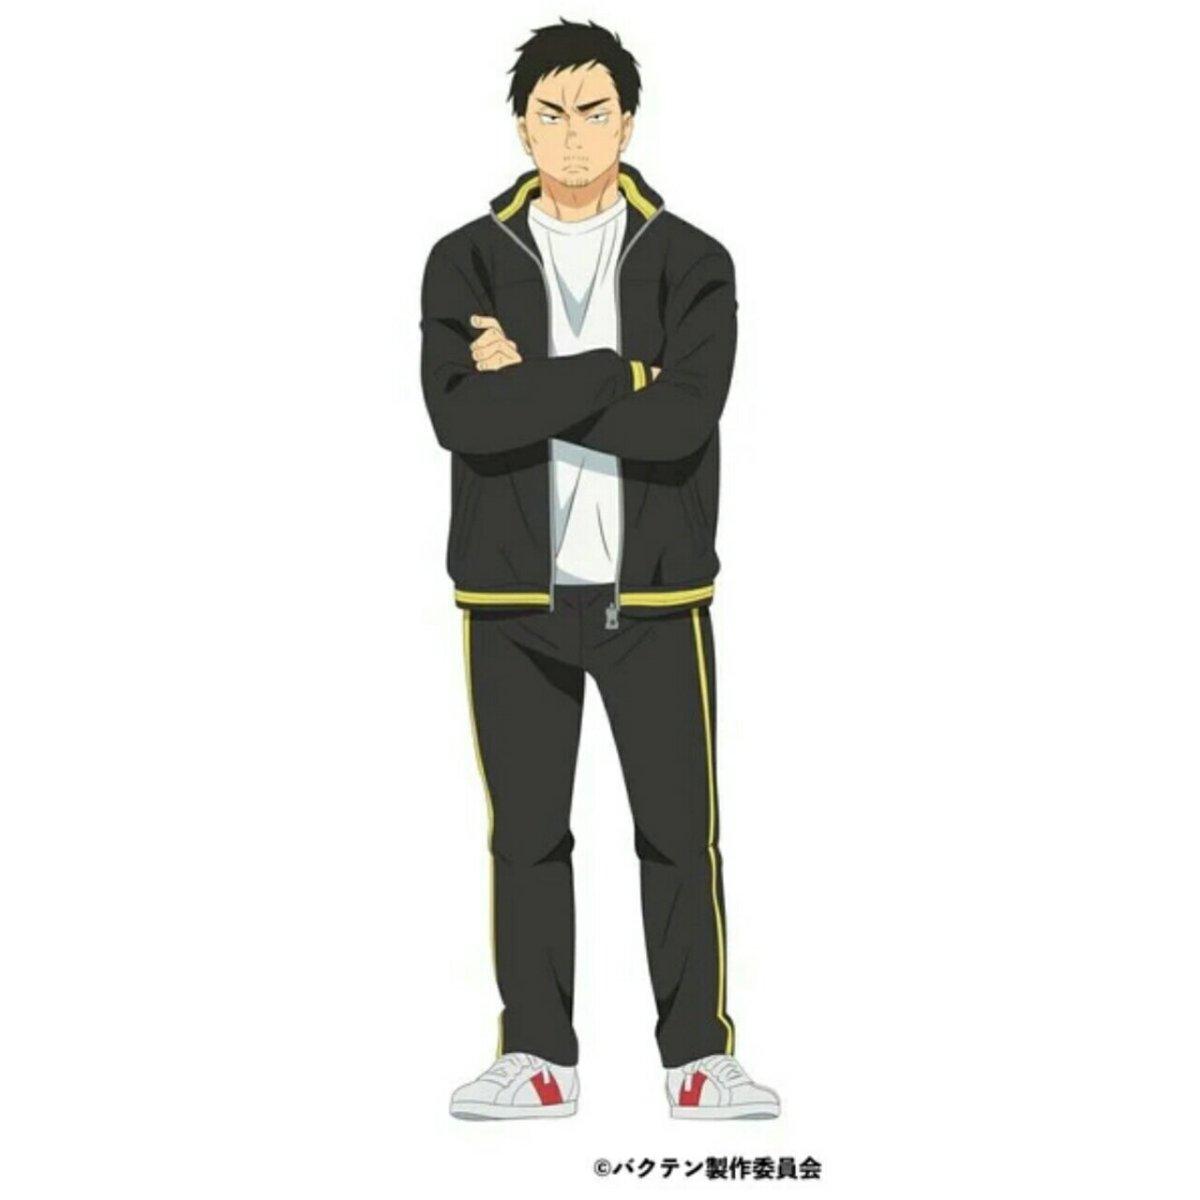 Kenichirō Matsuda Ikut Berperan dalam Anime Bakuten!! 2